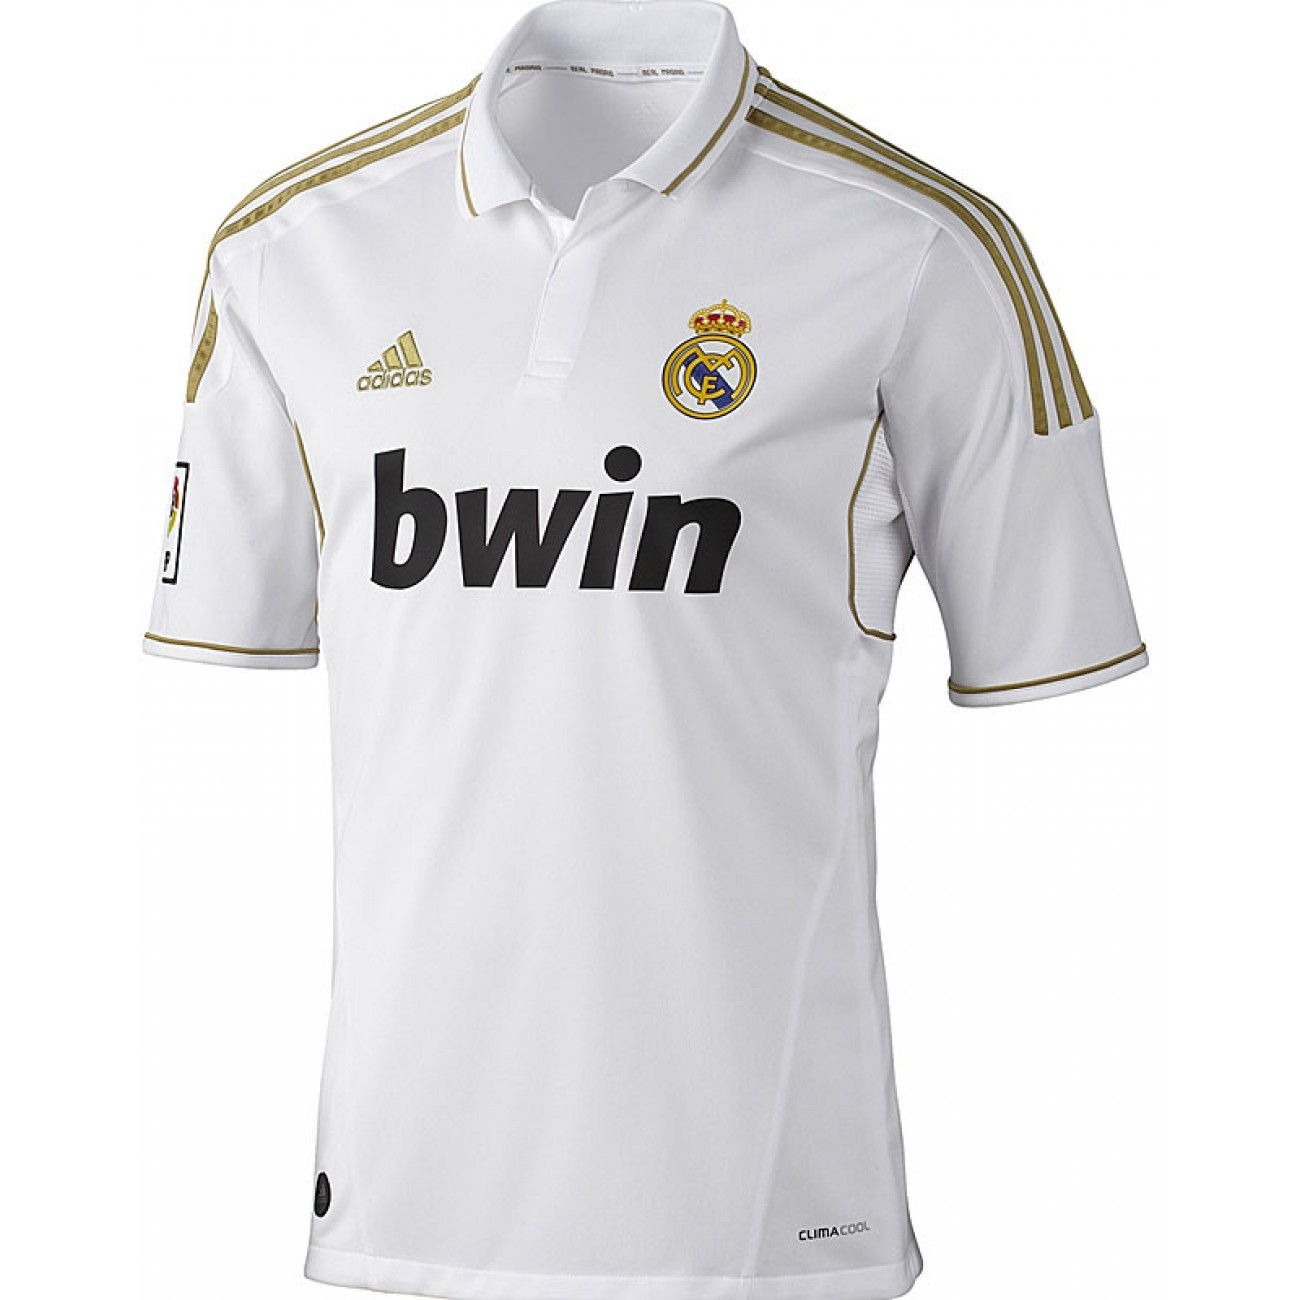 Maillot Real Madrid 2011-2012